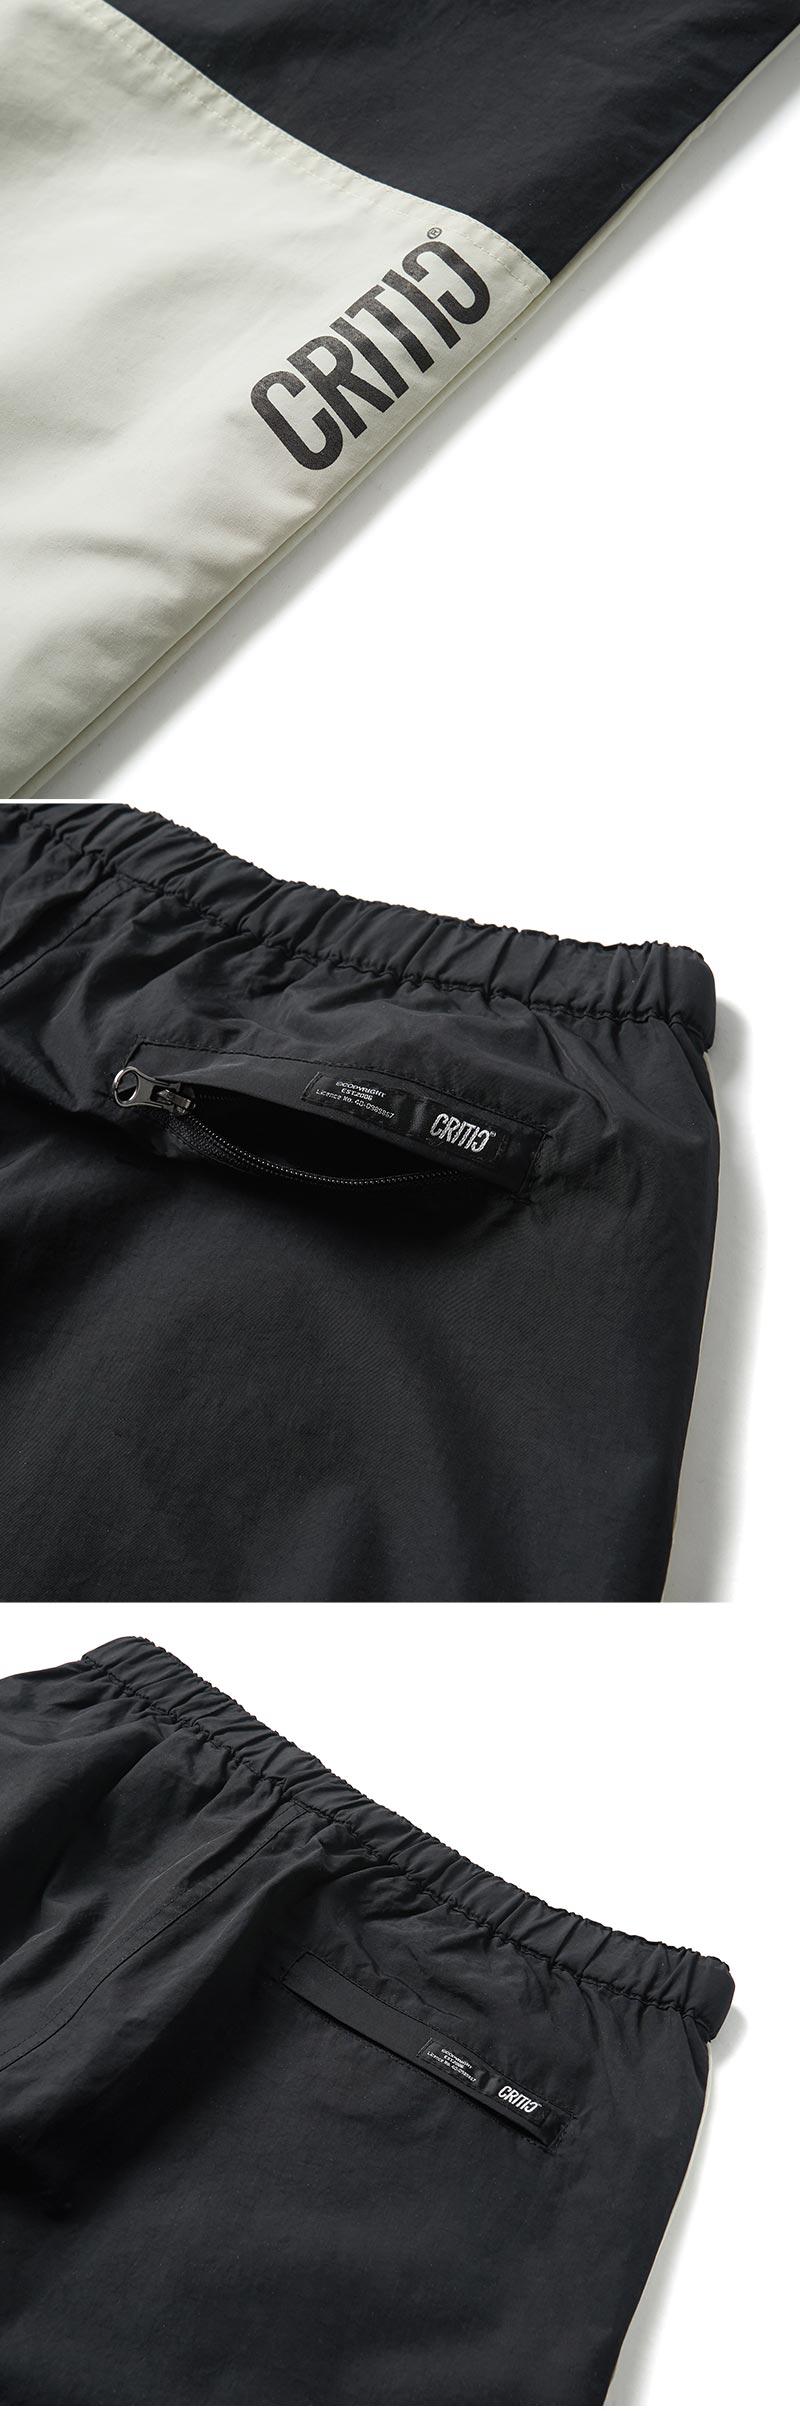 PROTECT PANTS(WHITE)_CTONPPT01UC2